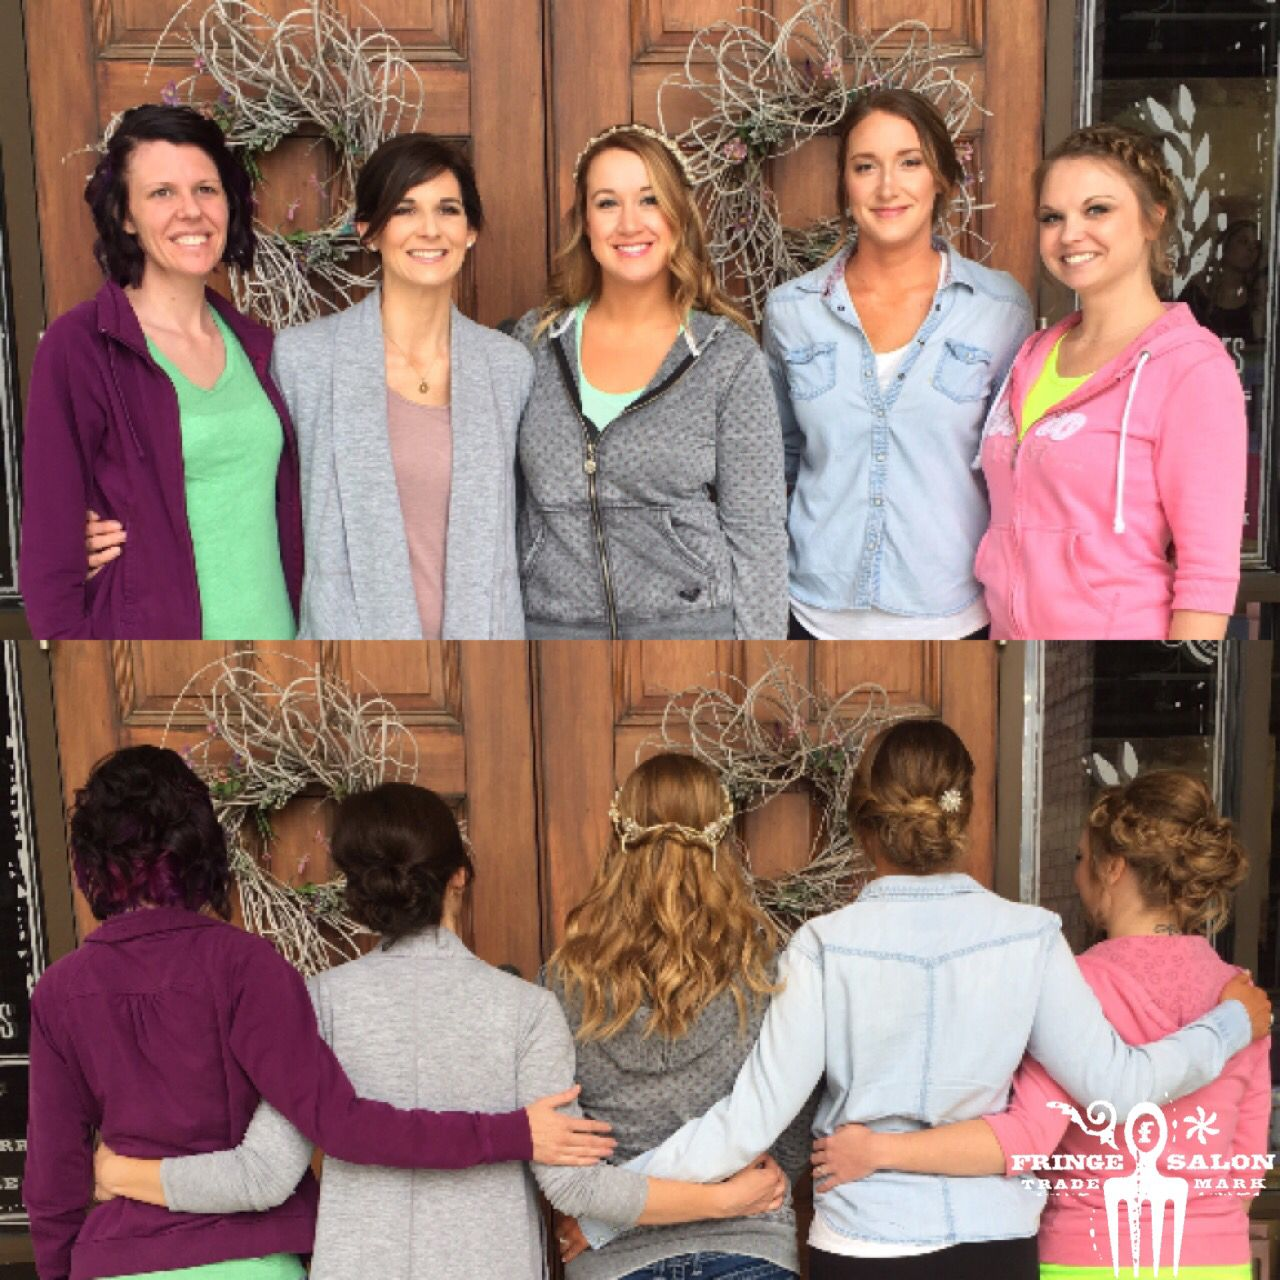 wedding hair & makeup by julie, lauren, mariah, alexx & kendi at